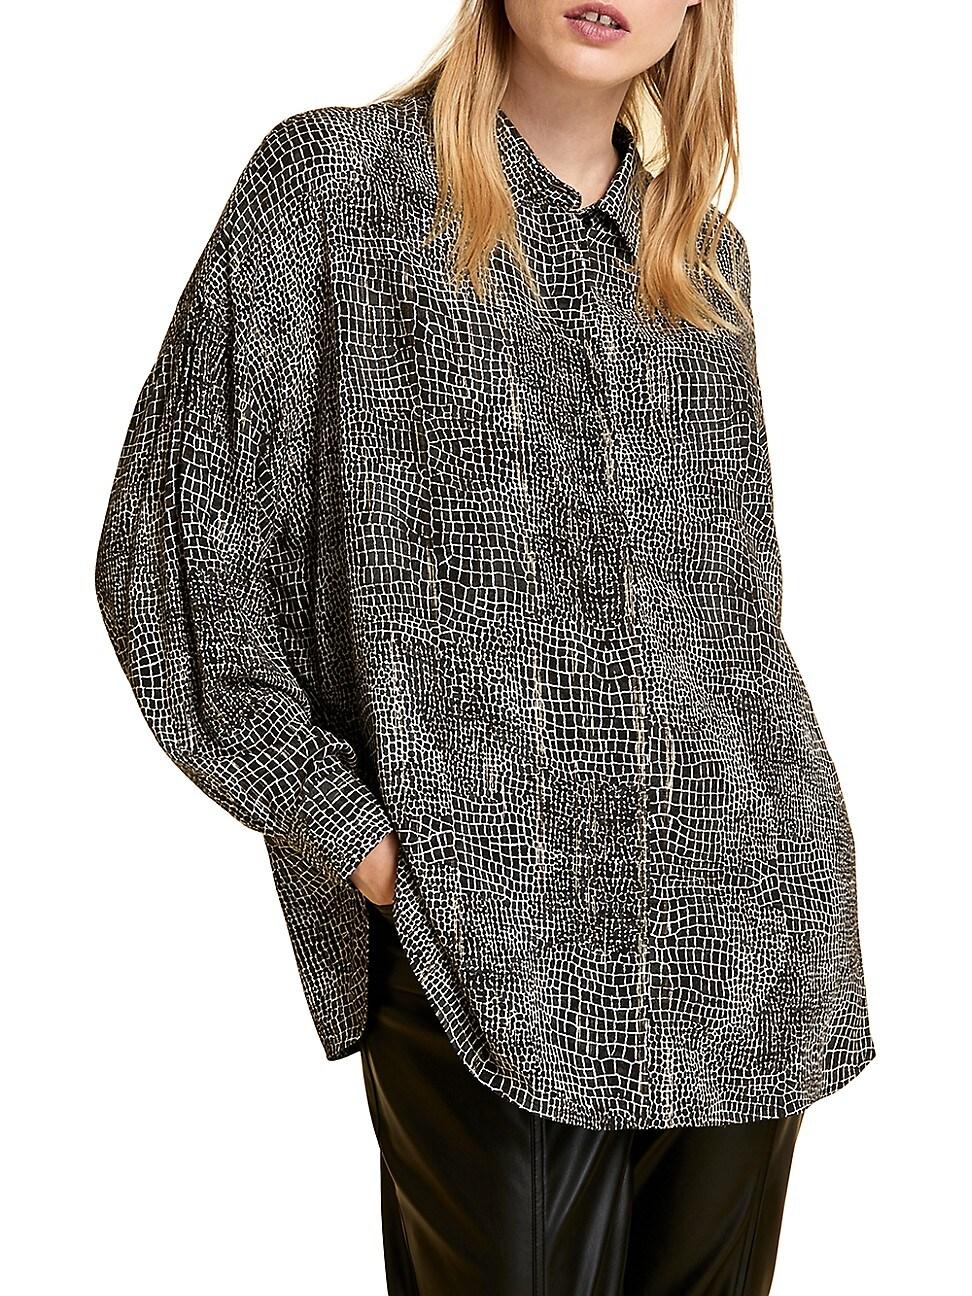 Marina Rinaldi Bantu Croc Print Metallic Button Up Shirt In Black